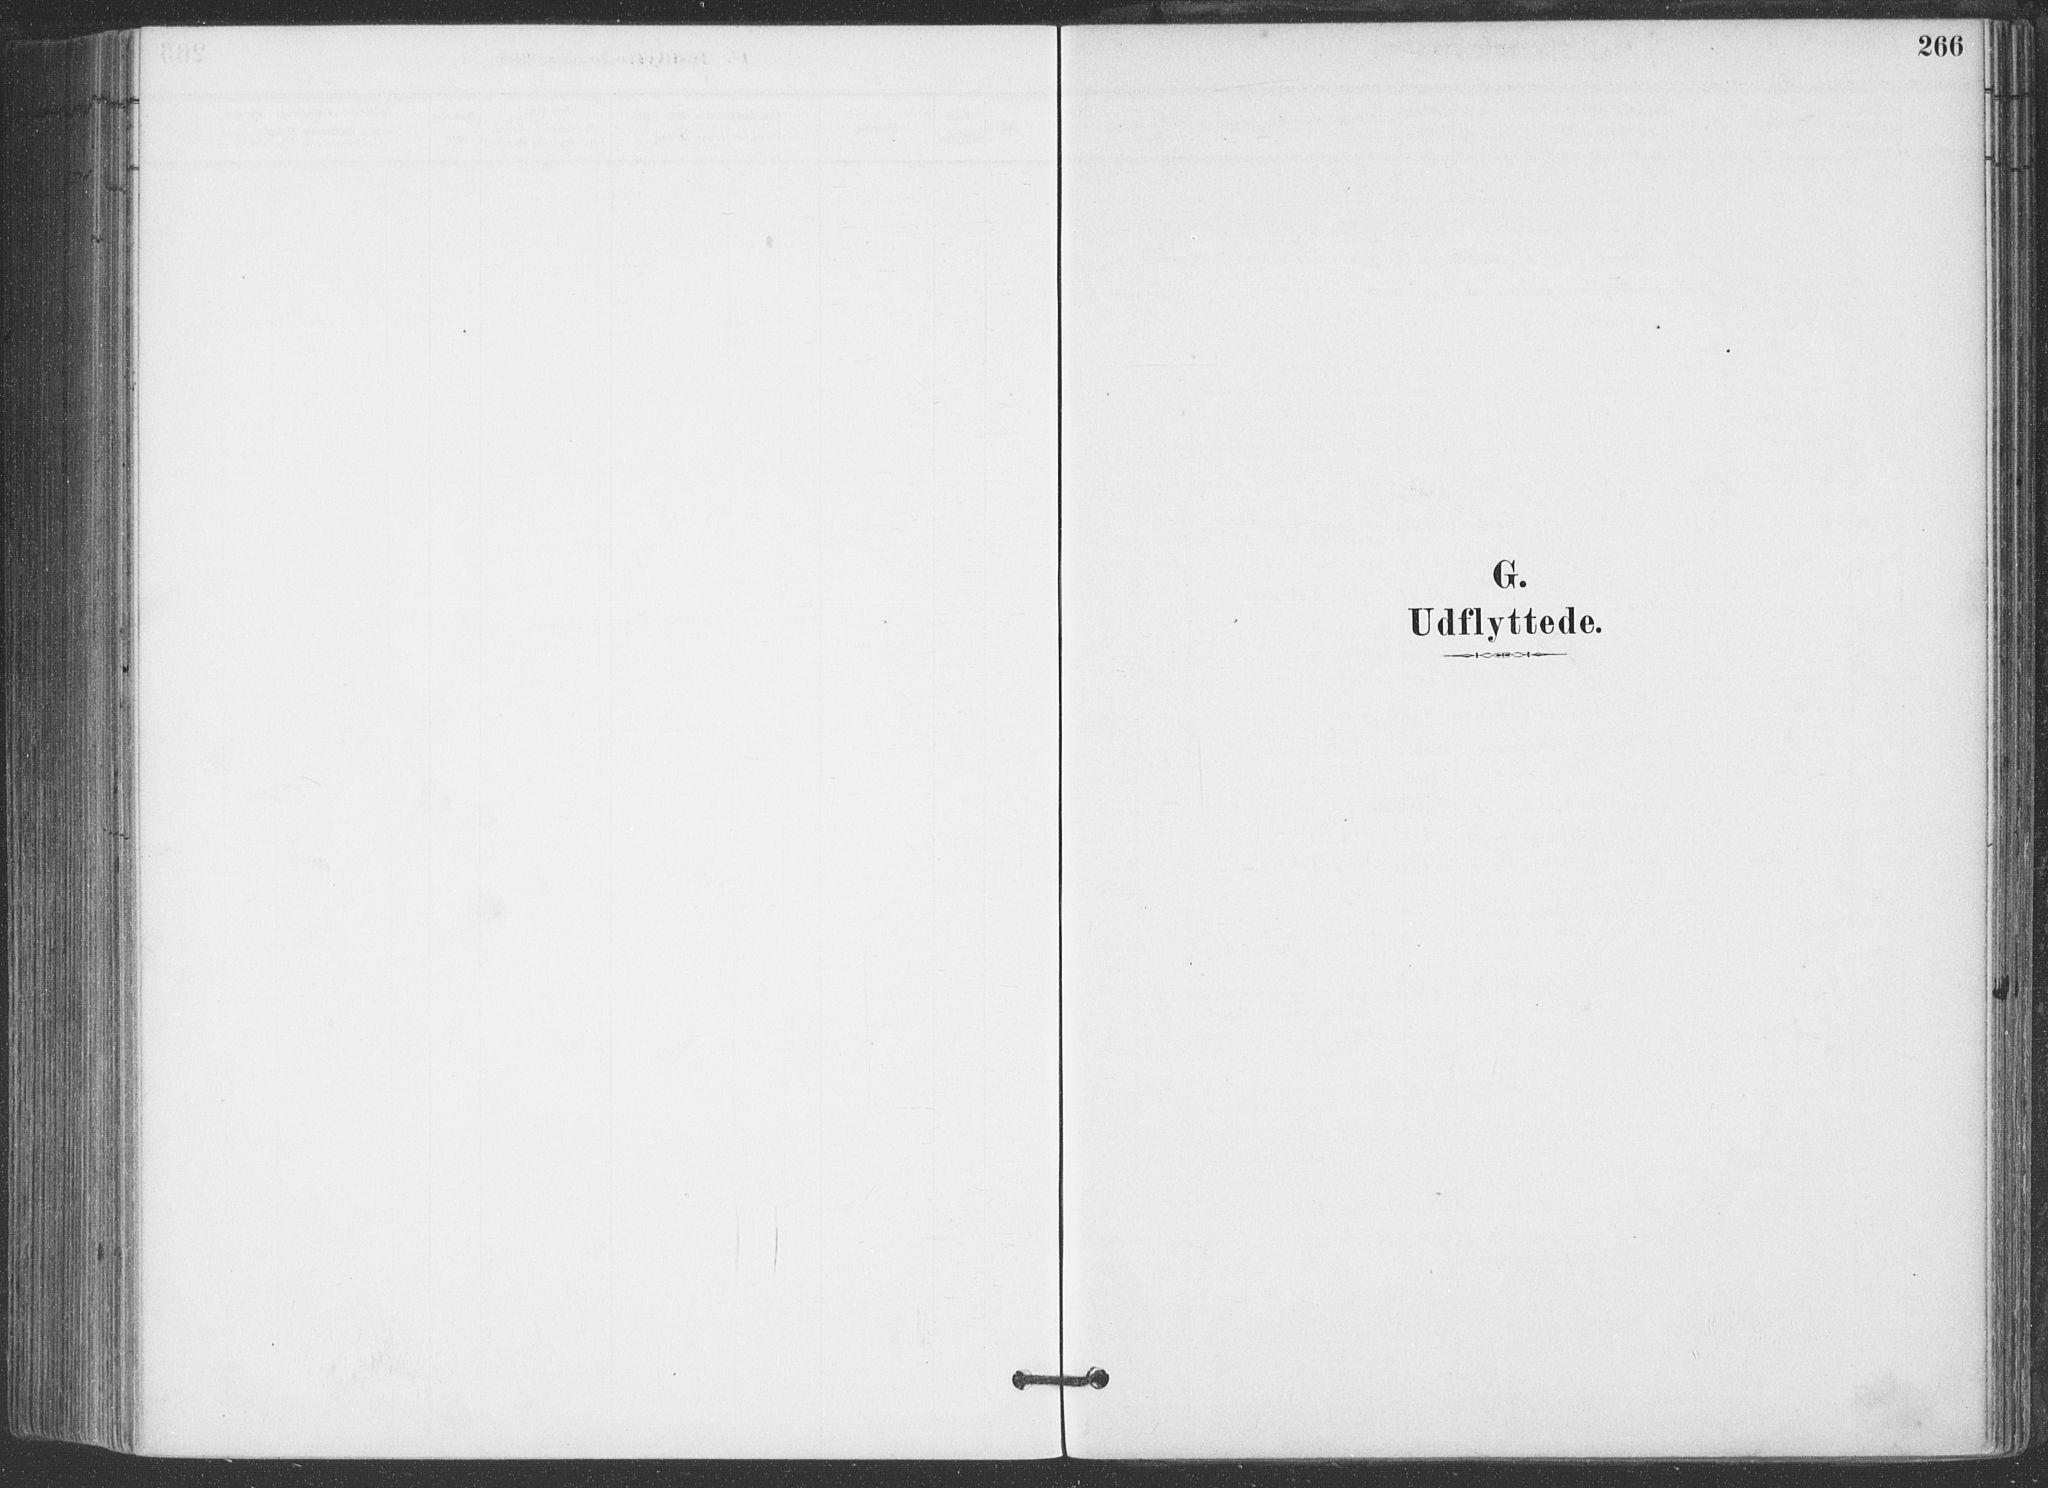 SAKO, Hjartdal kirkebøker, F/Fa/L0010: Ministerialbok nr. I 10, 1880-1929, s. 266